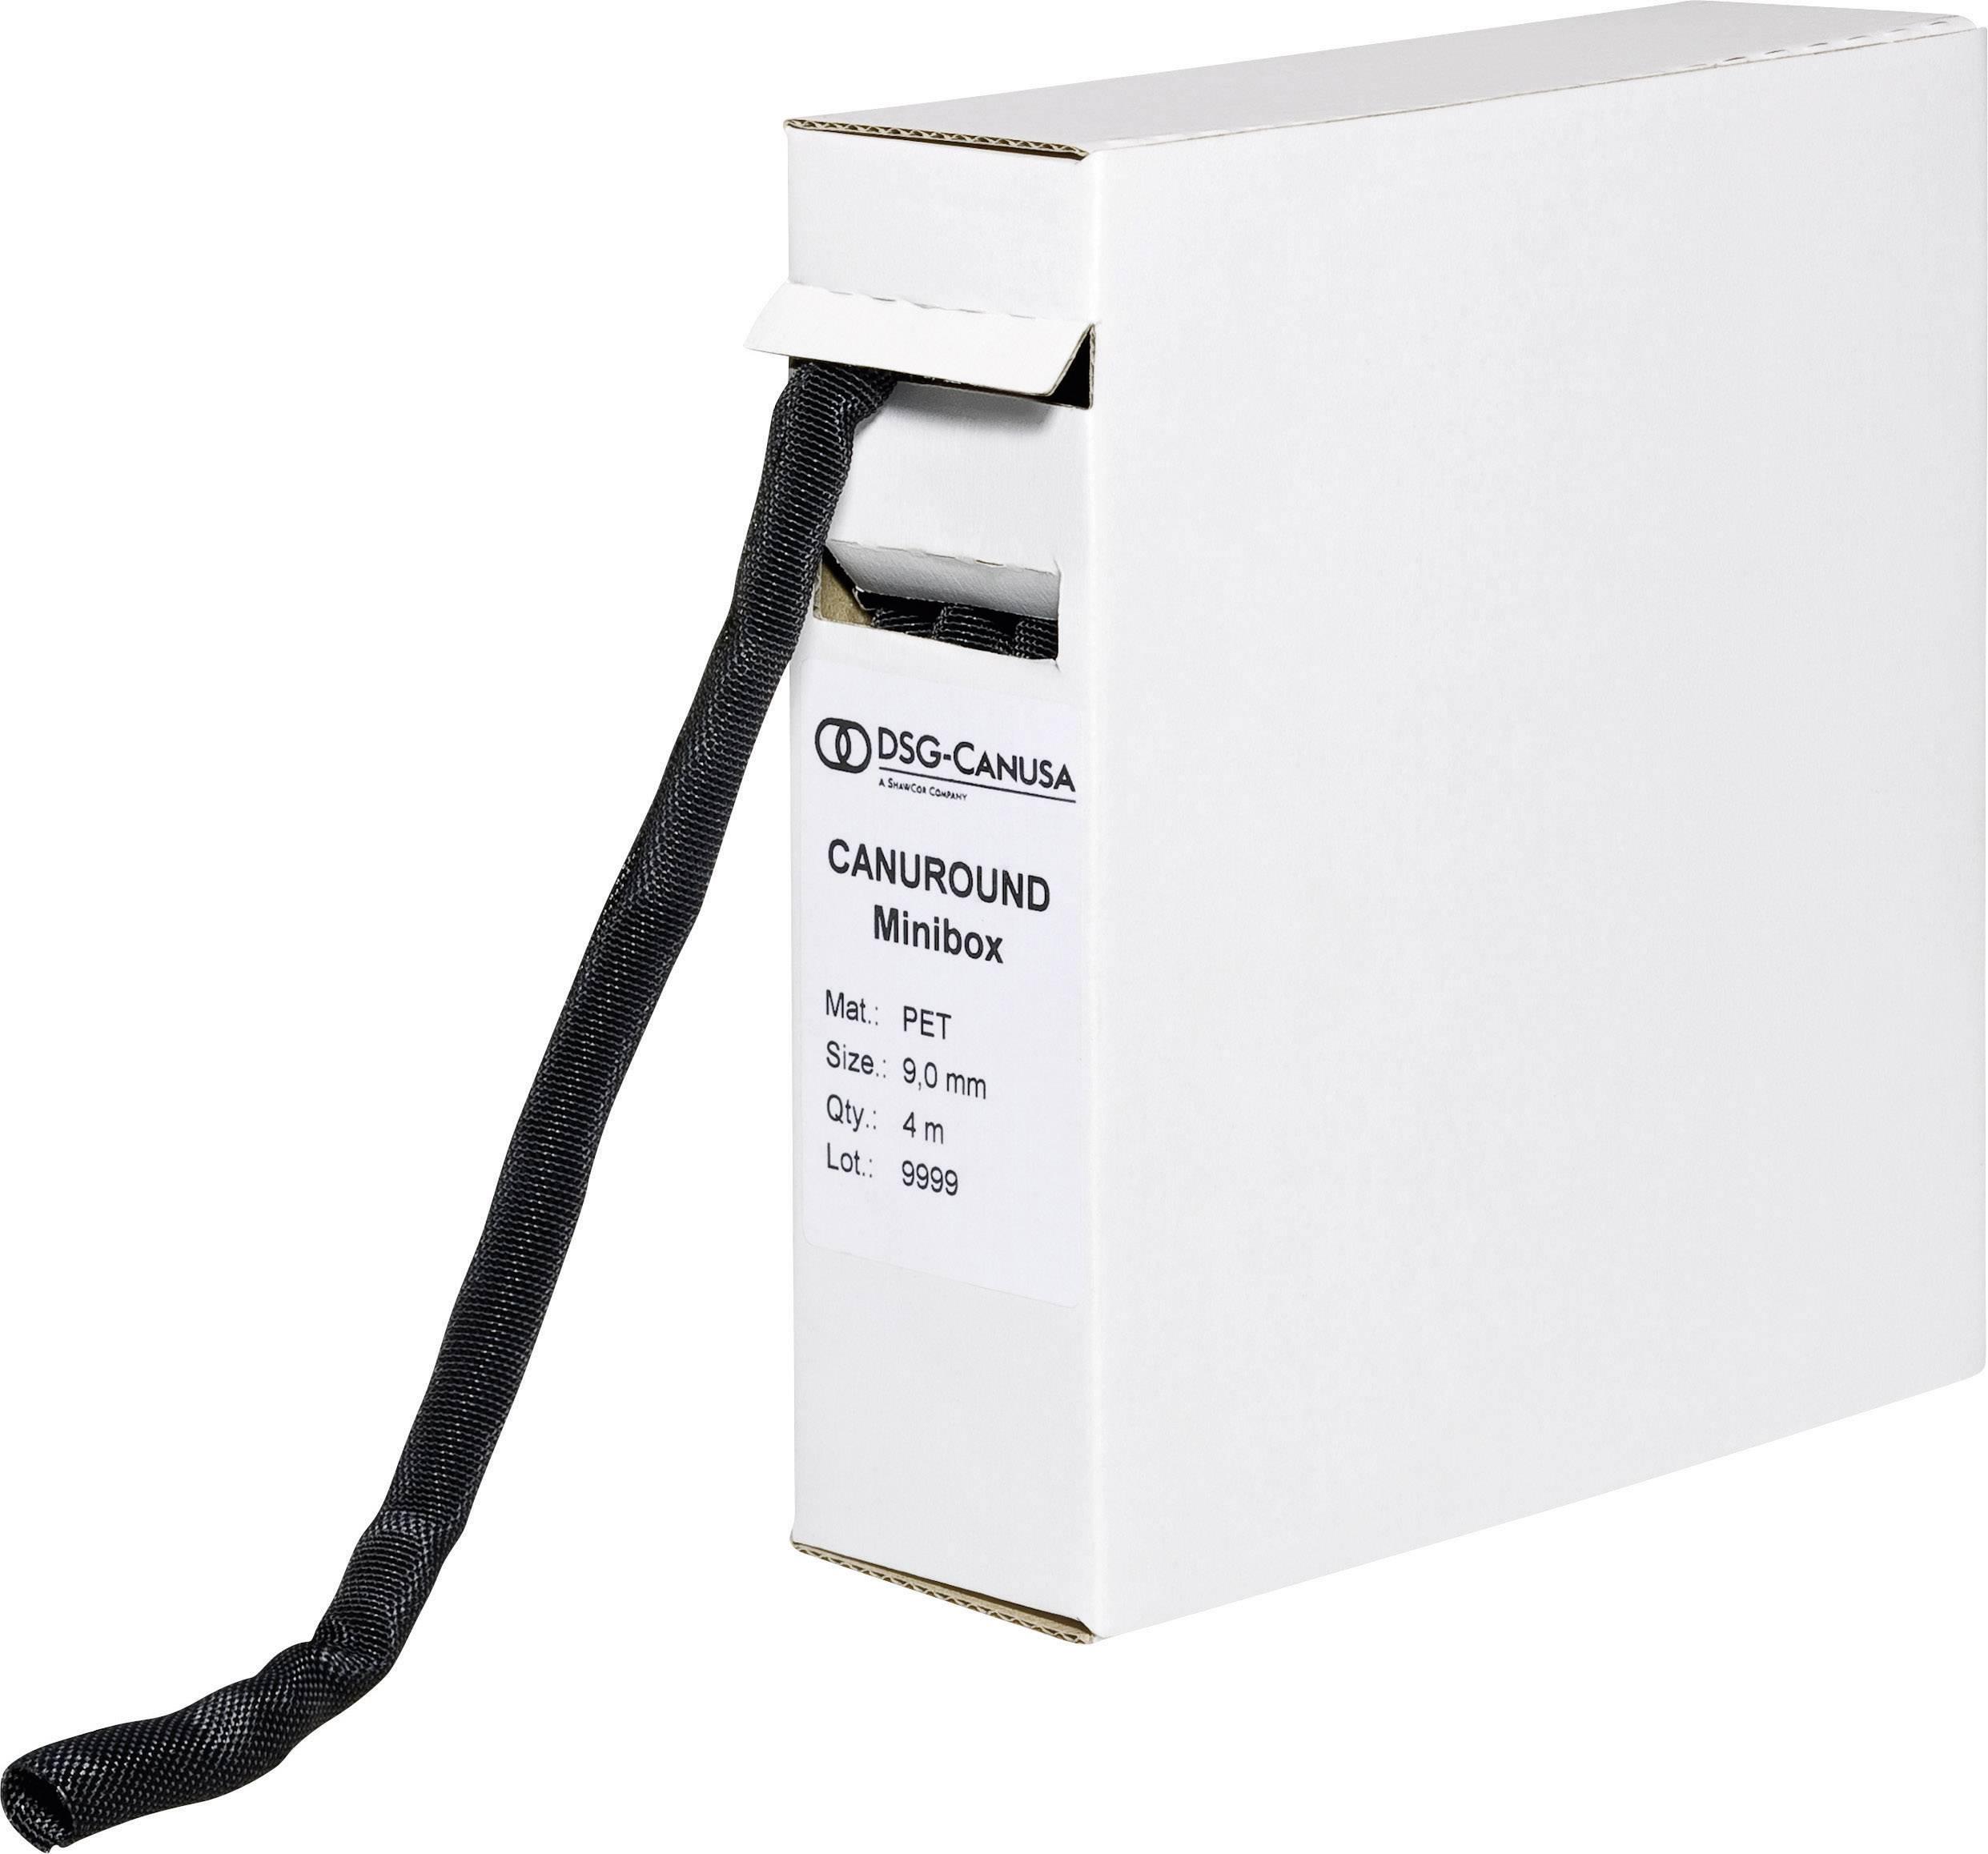 Ochranný oplet DSG Canusa 13 do 13 mm, -55 do +150 °C, 3 m, čierna